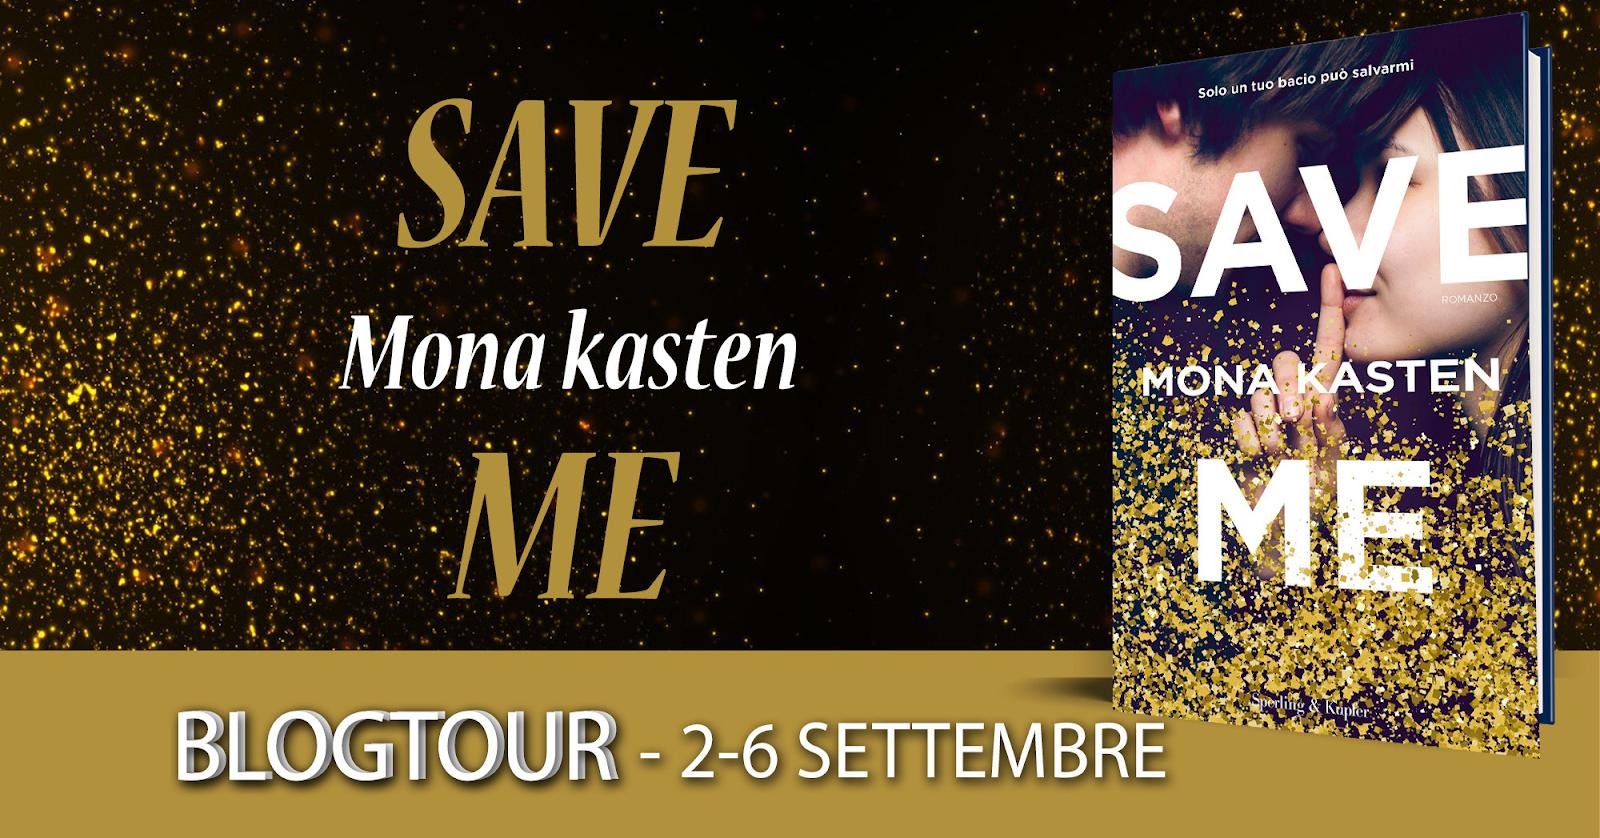 Blogtour Save Me di Mona Kasten